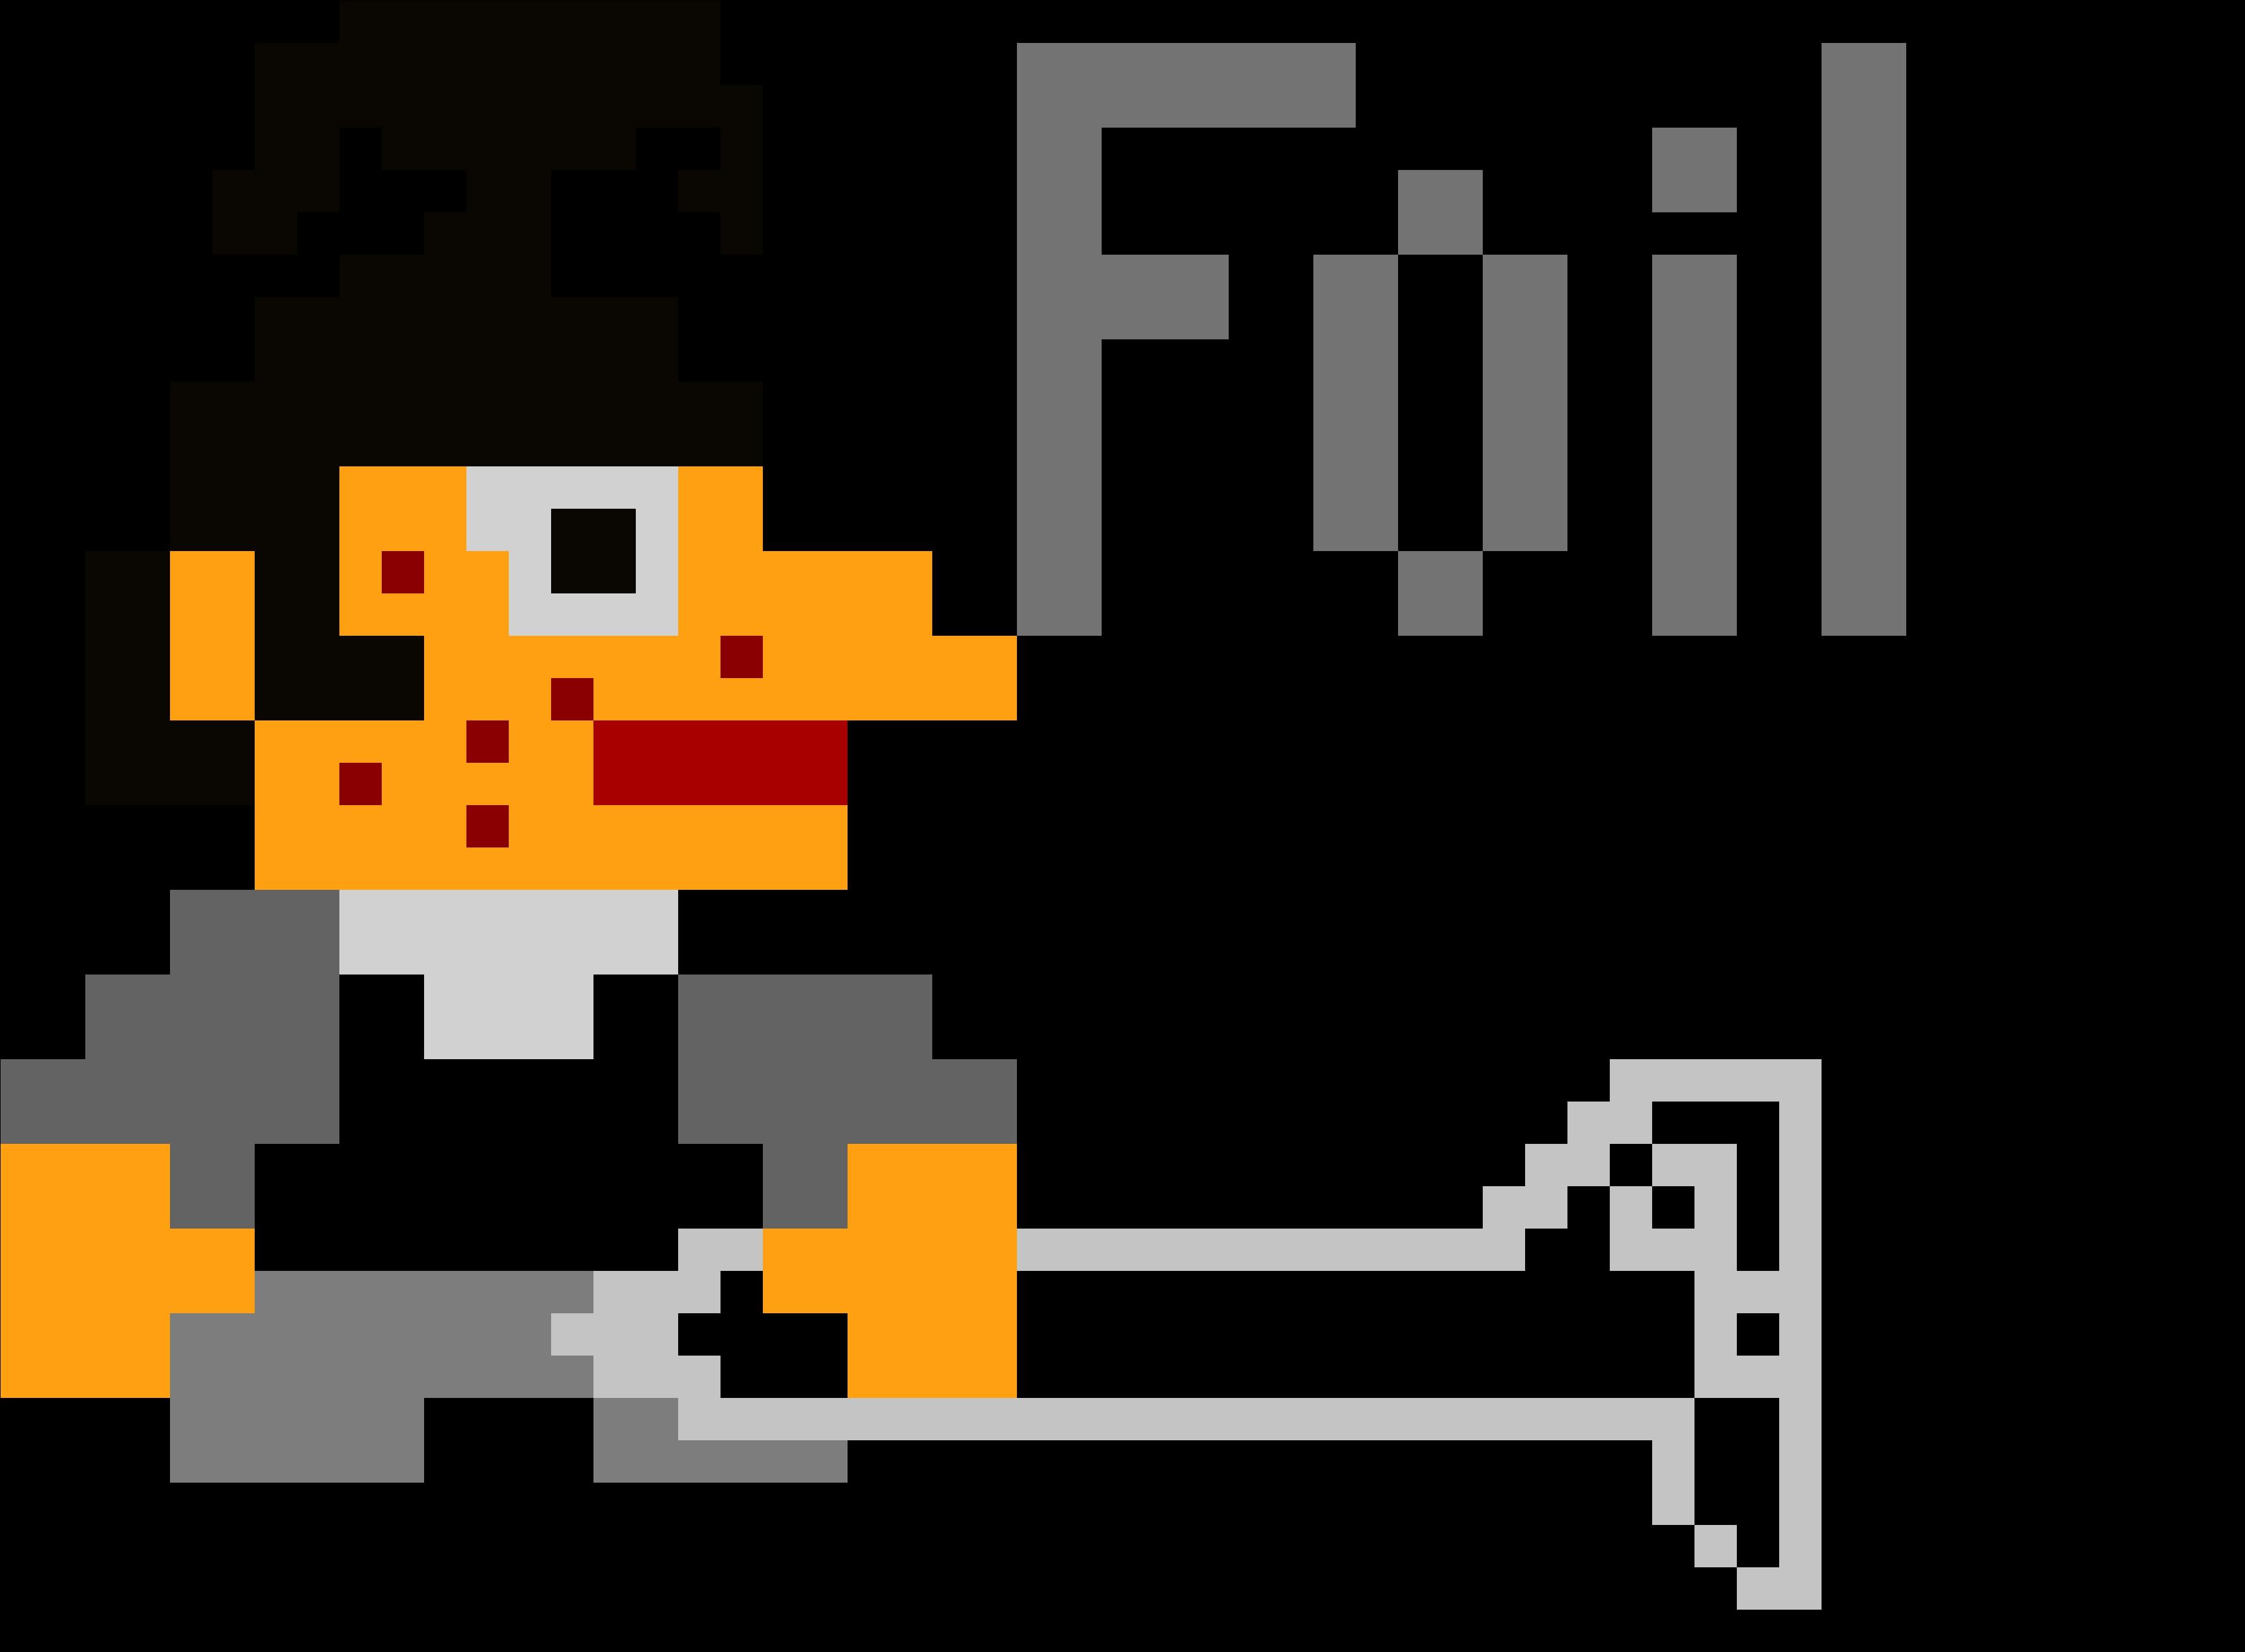 Foil Man Mario Pixel Art By Levi 8 Bit Pixel Mario Clipart